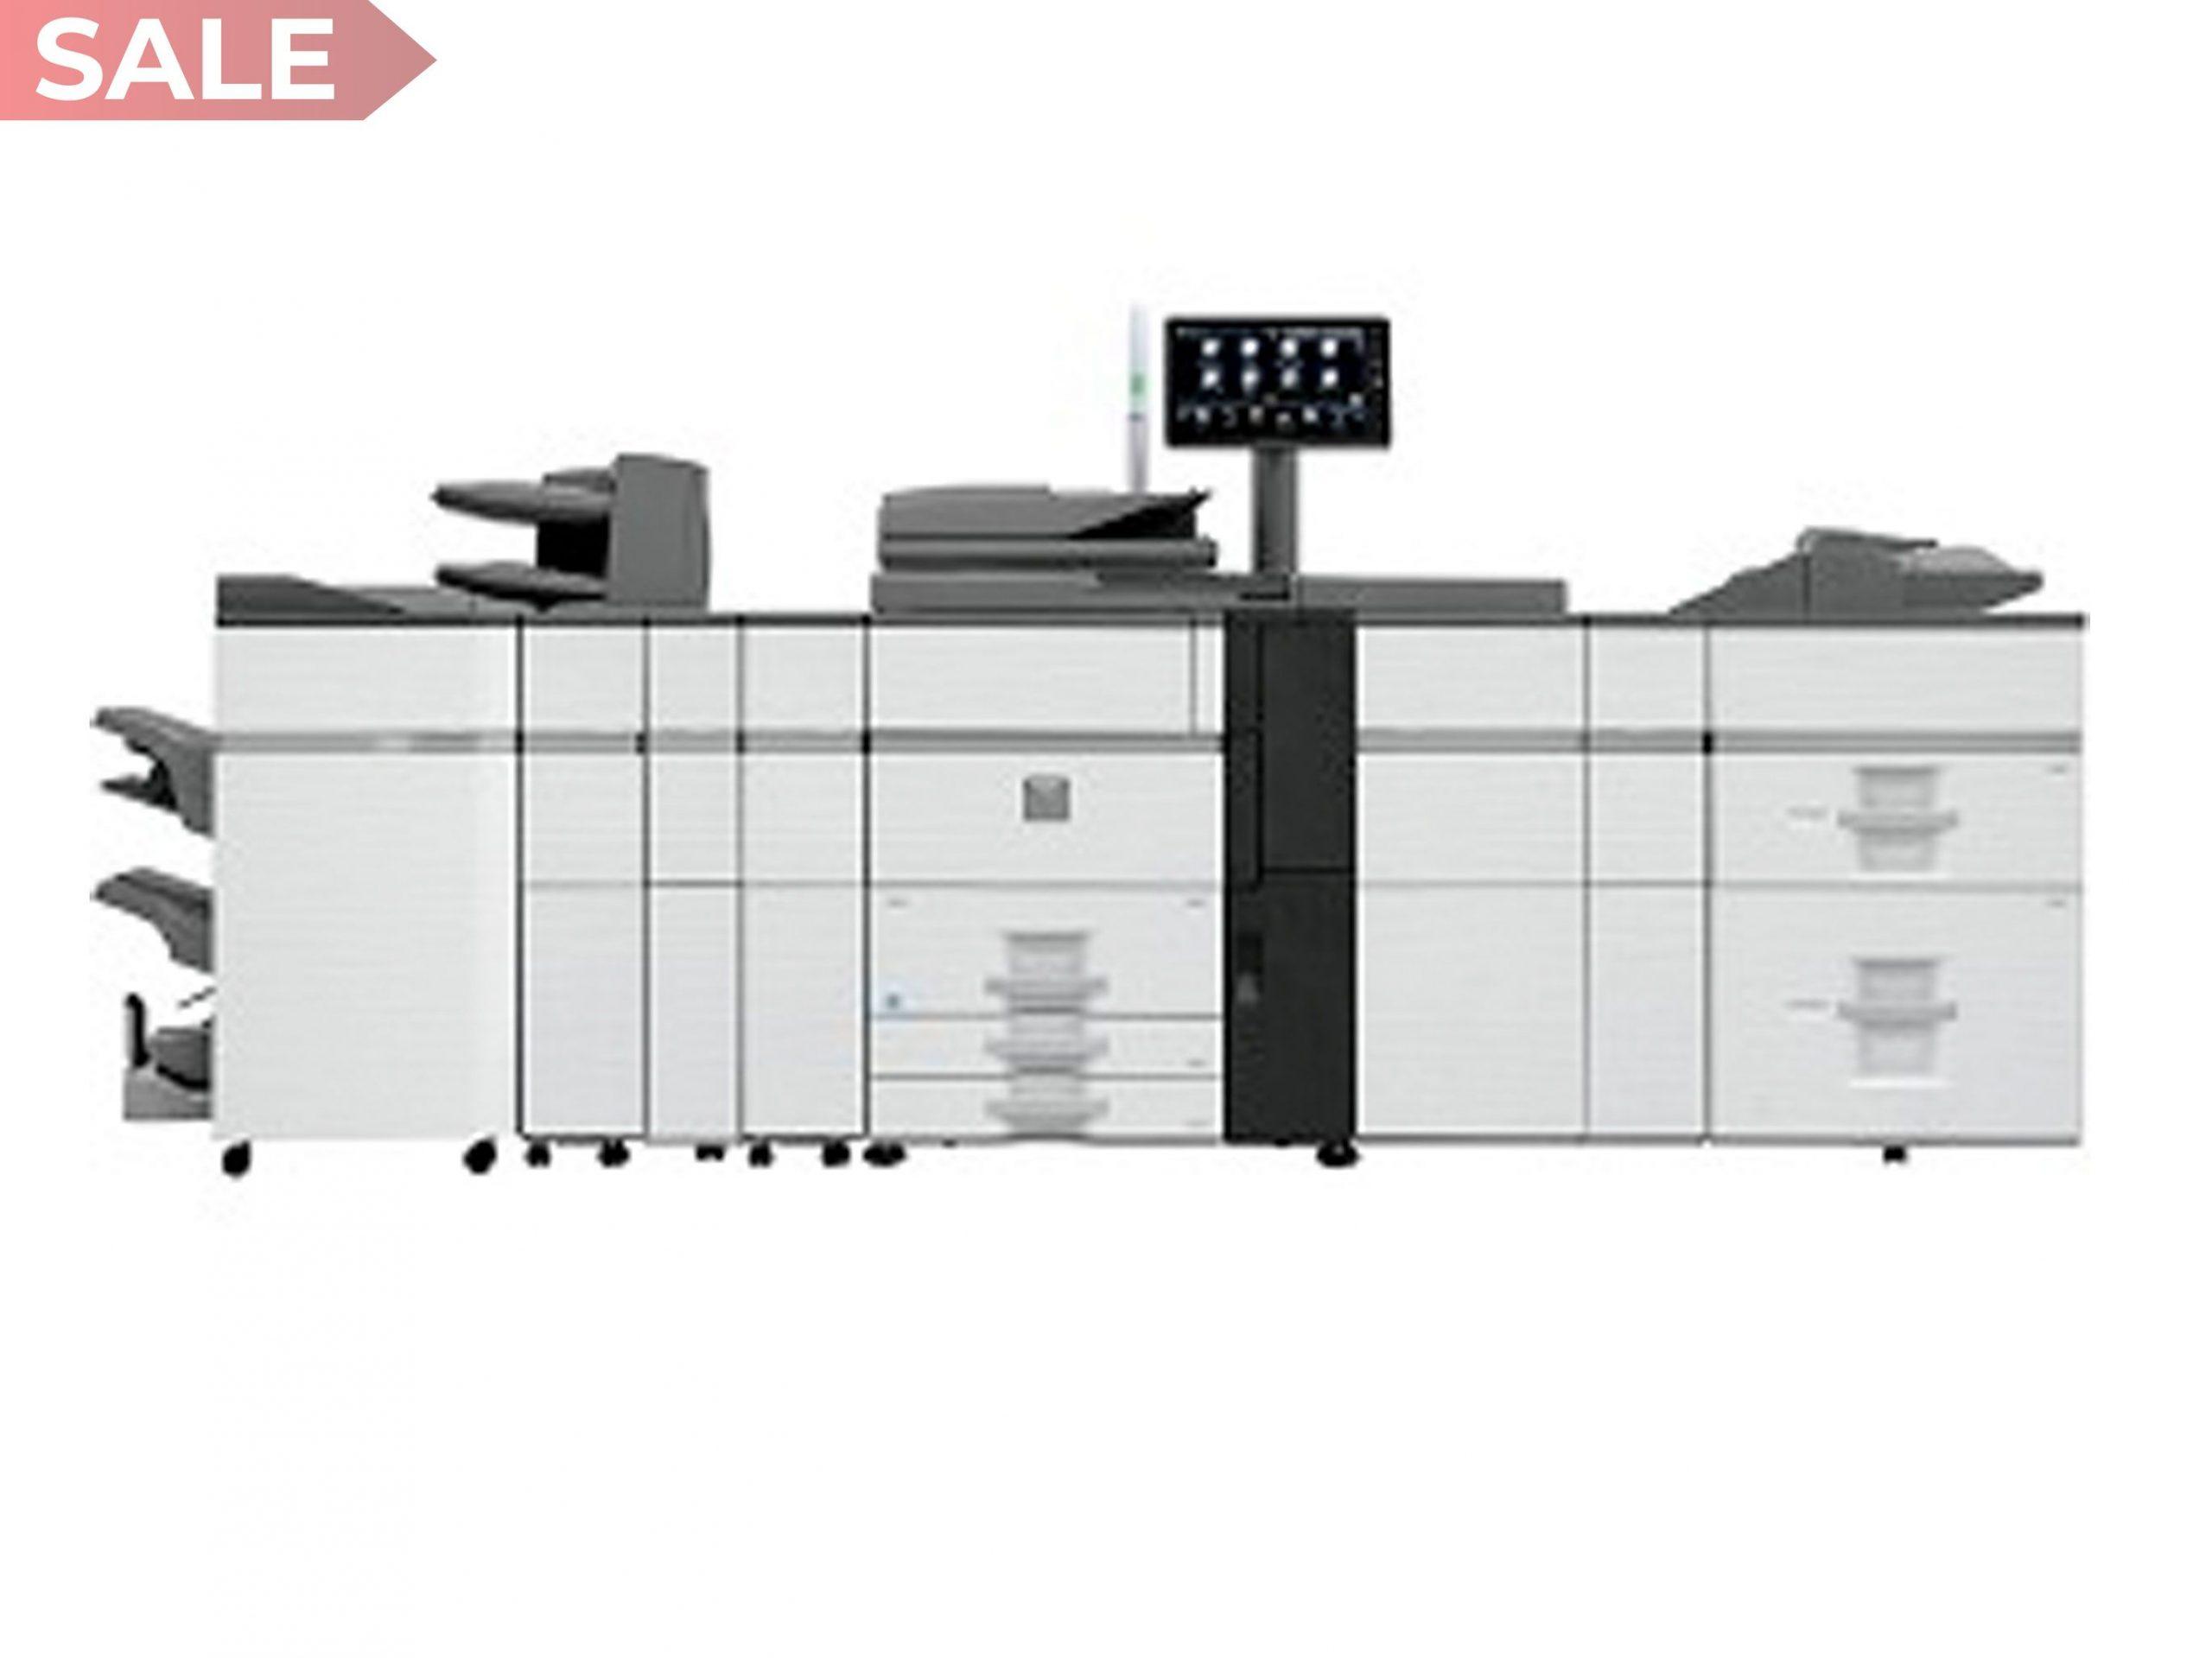 Sharp MX-7500N Low Price